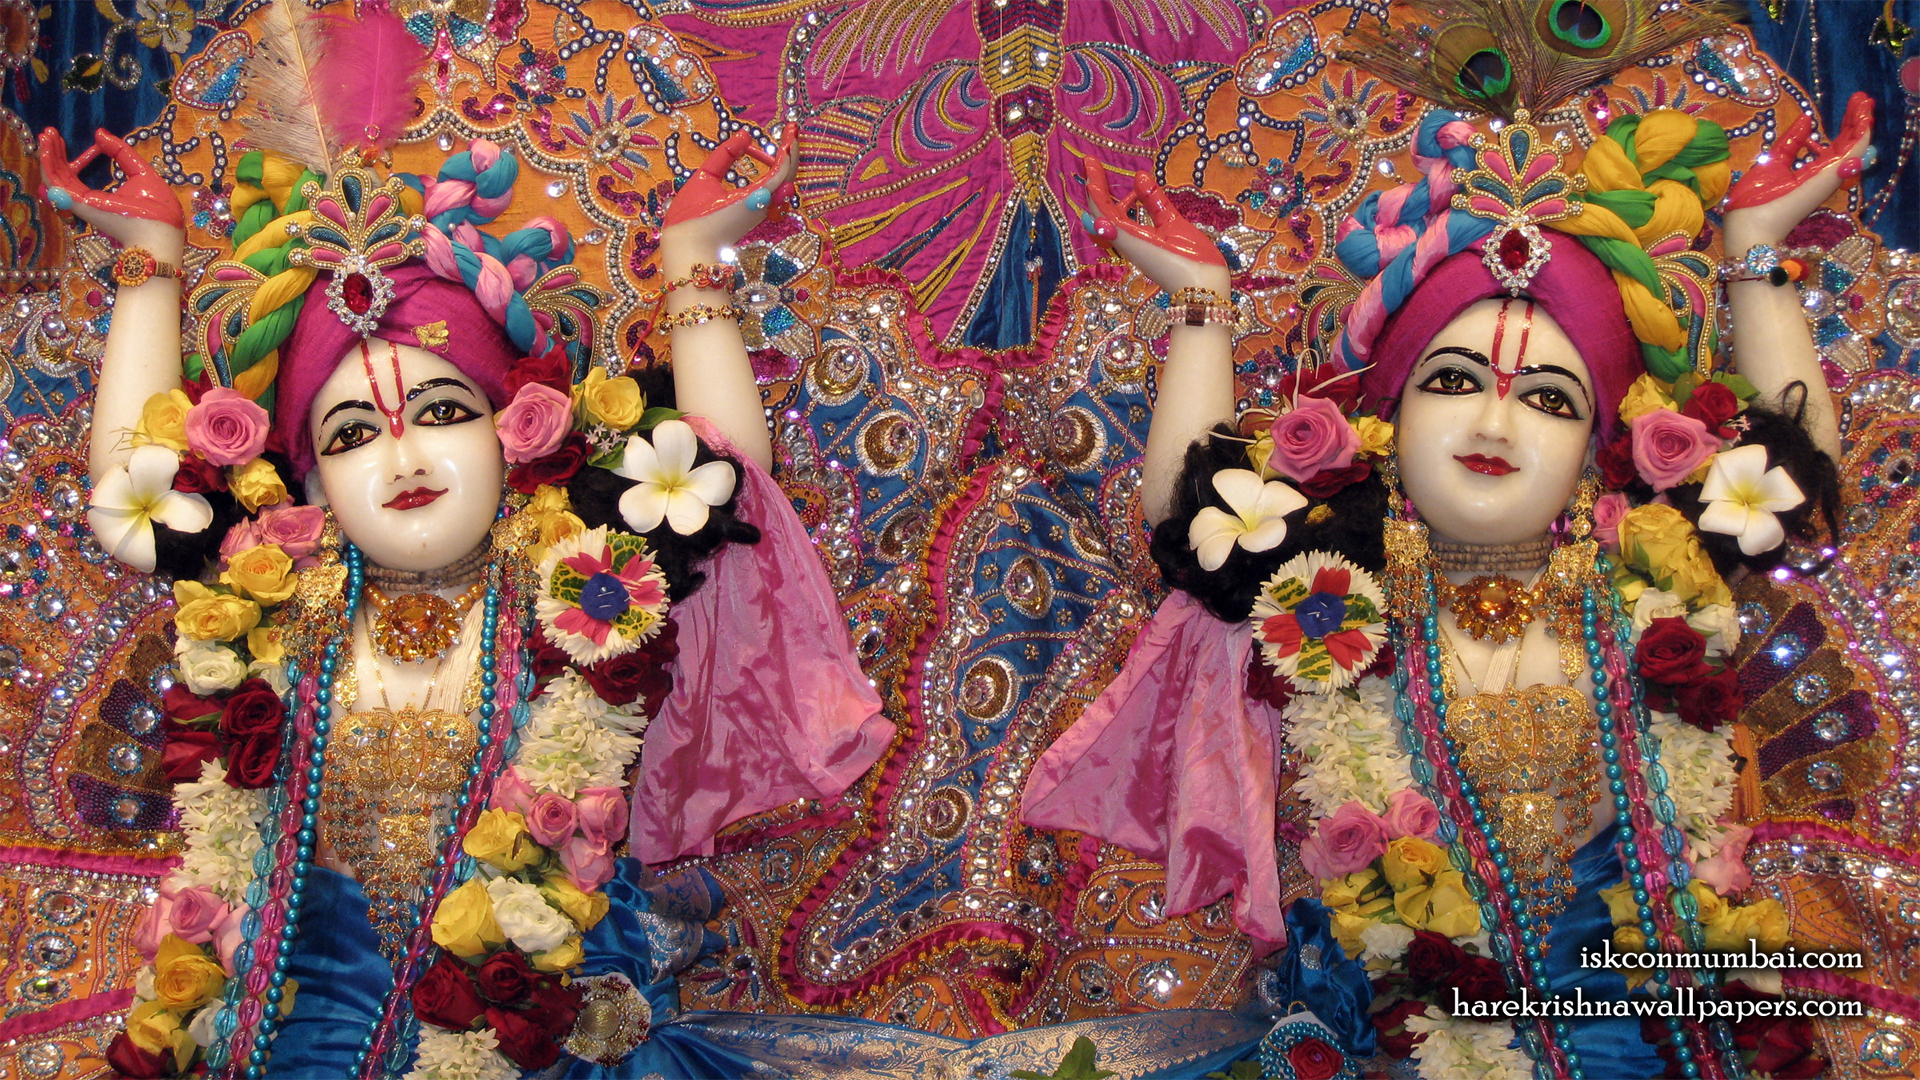 Sri Sri Gaura Nitai Close up Wallpaper (006) Size 1920x1080 Download